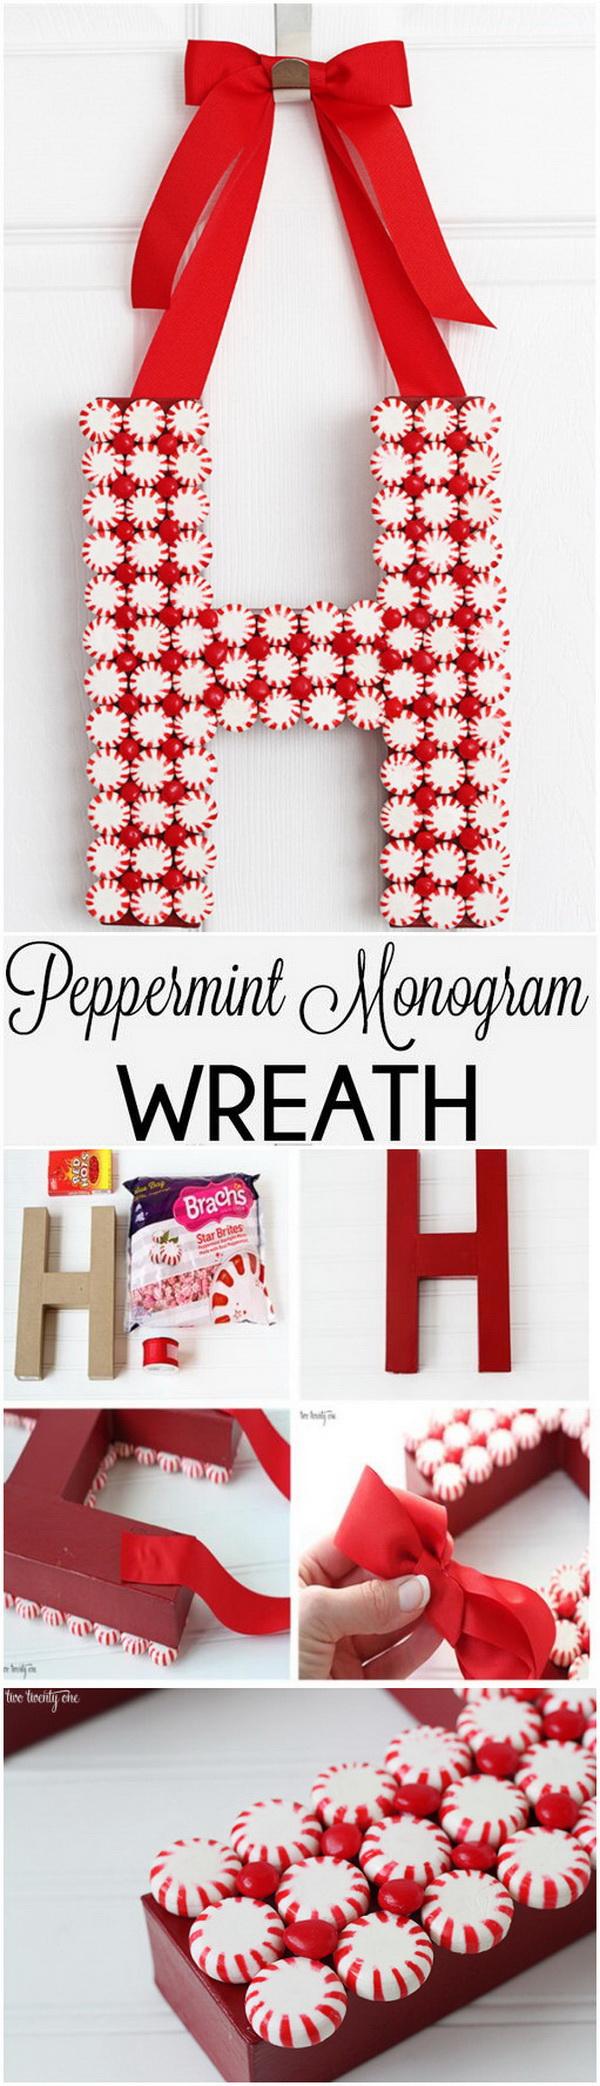 Peppermint Monogram Wreath.